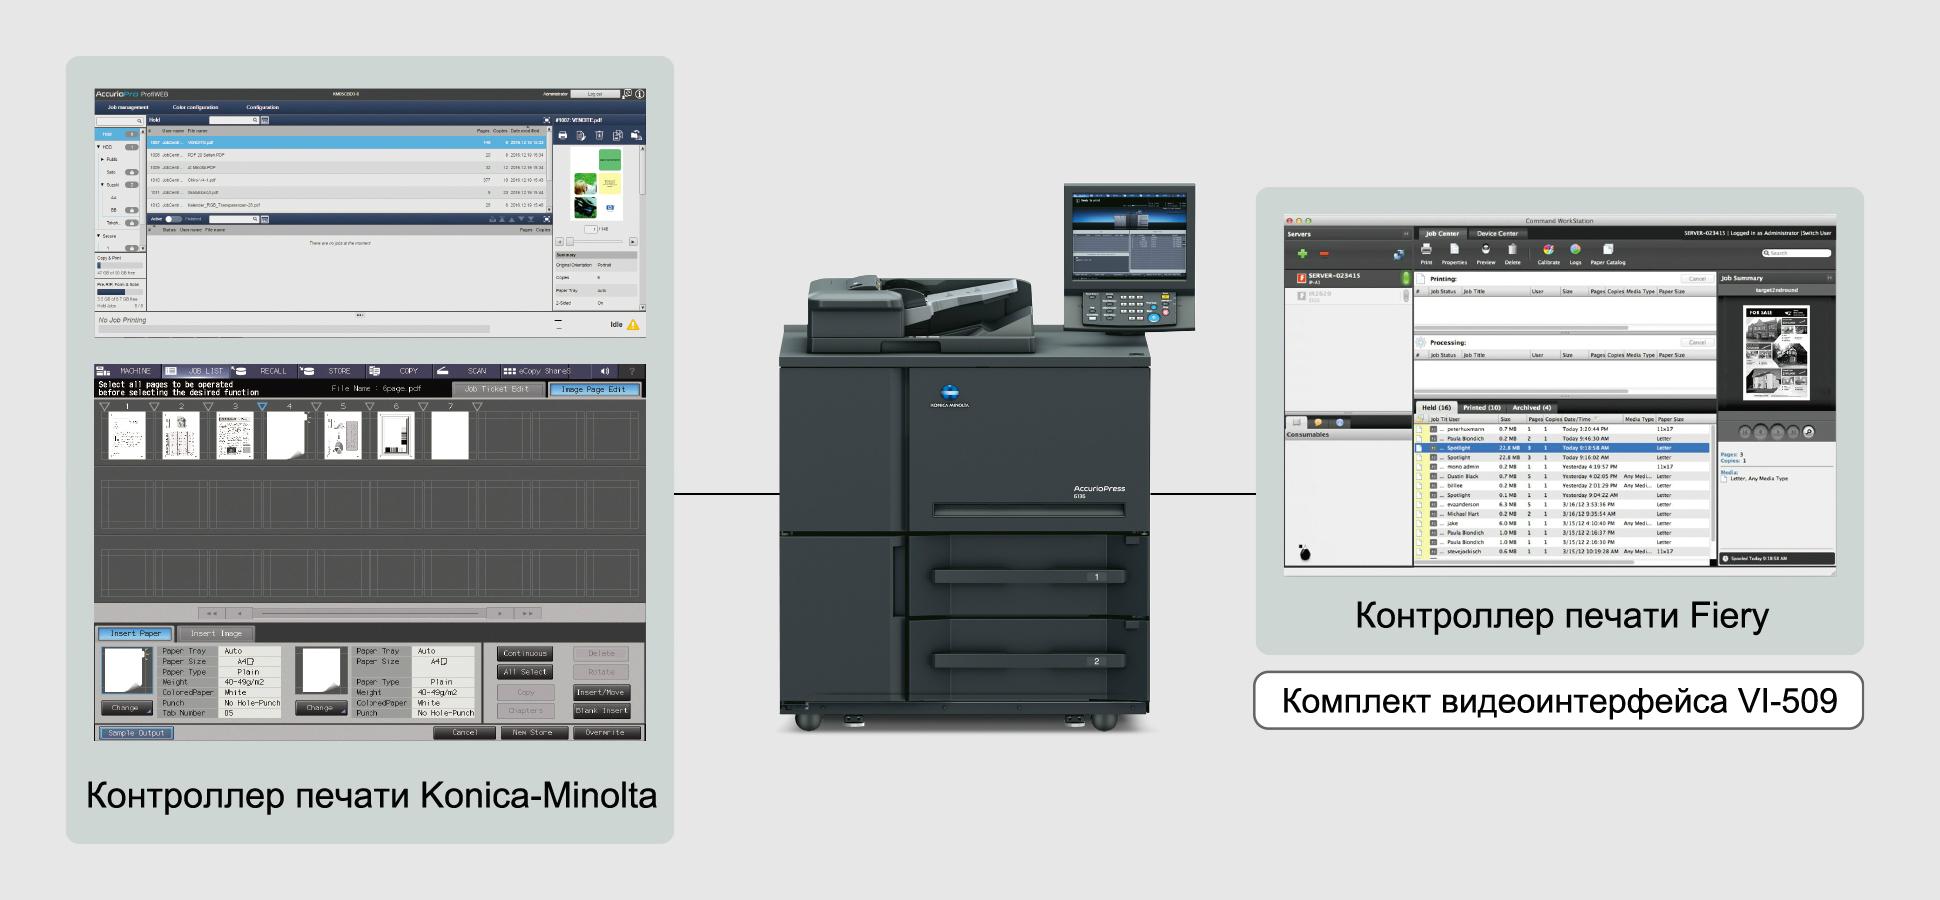 Konica Minolta AccurioPress 6136P. Совместимость с контроллером EFI